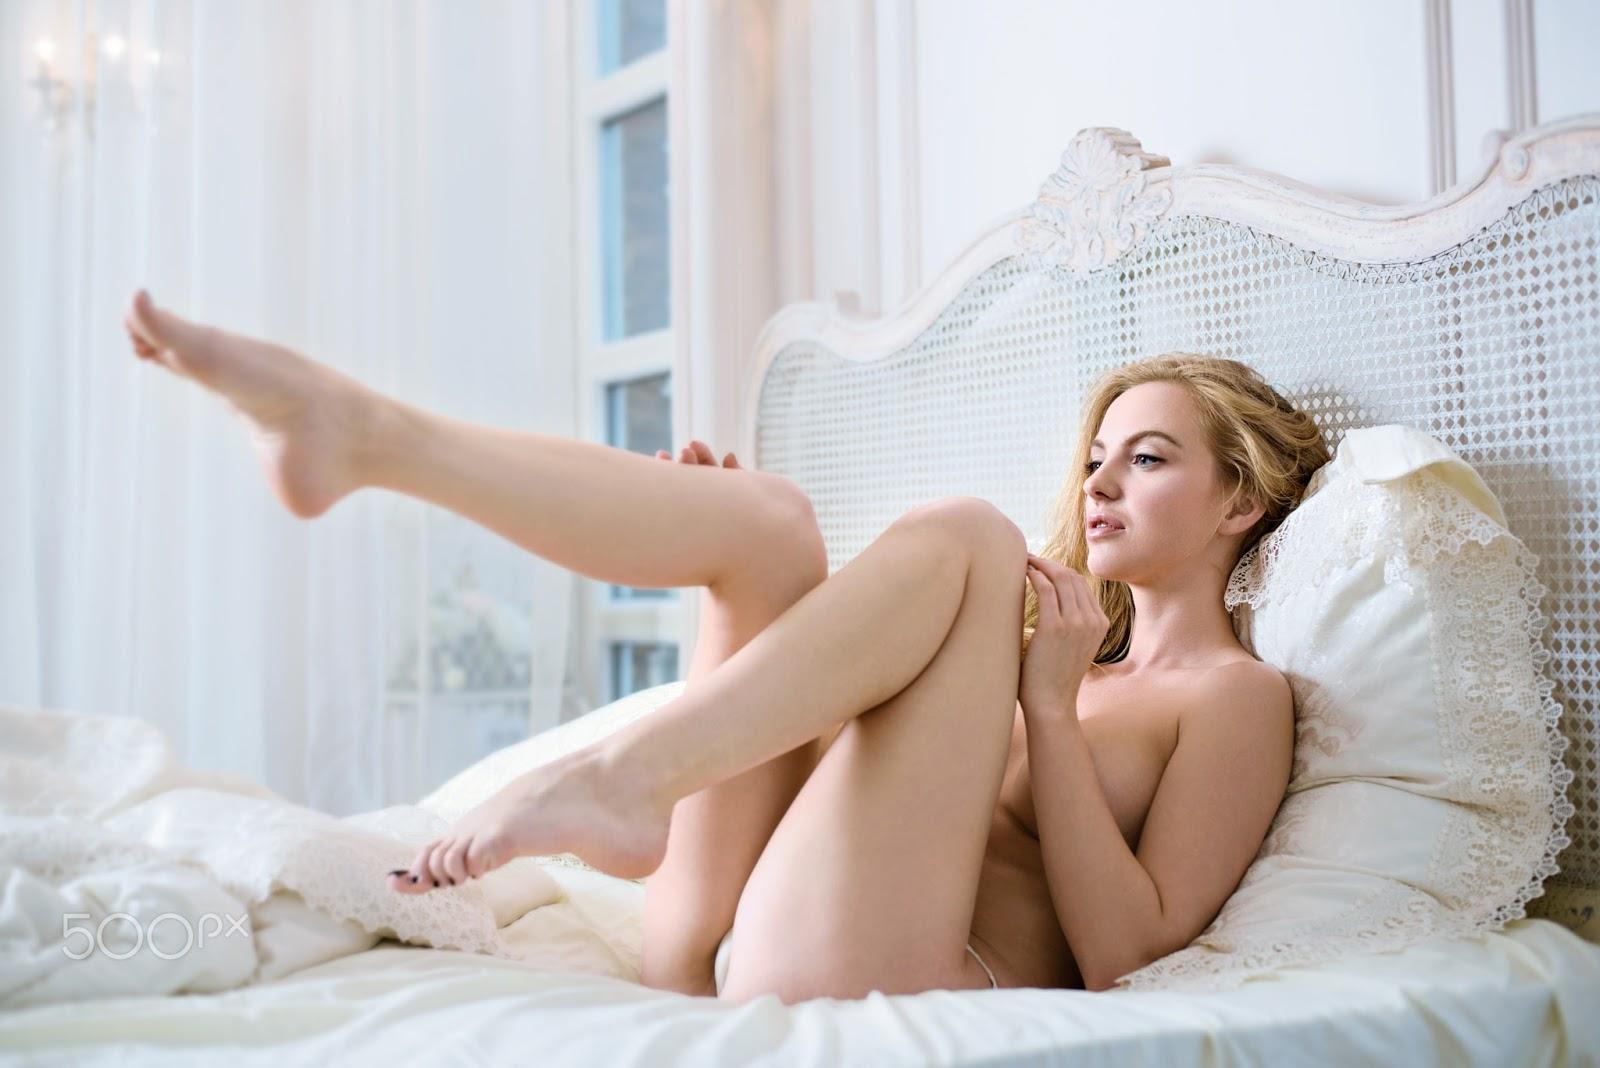 One sexy butt nude beautiful!!